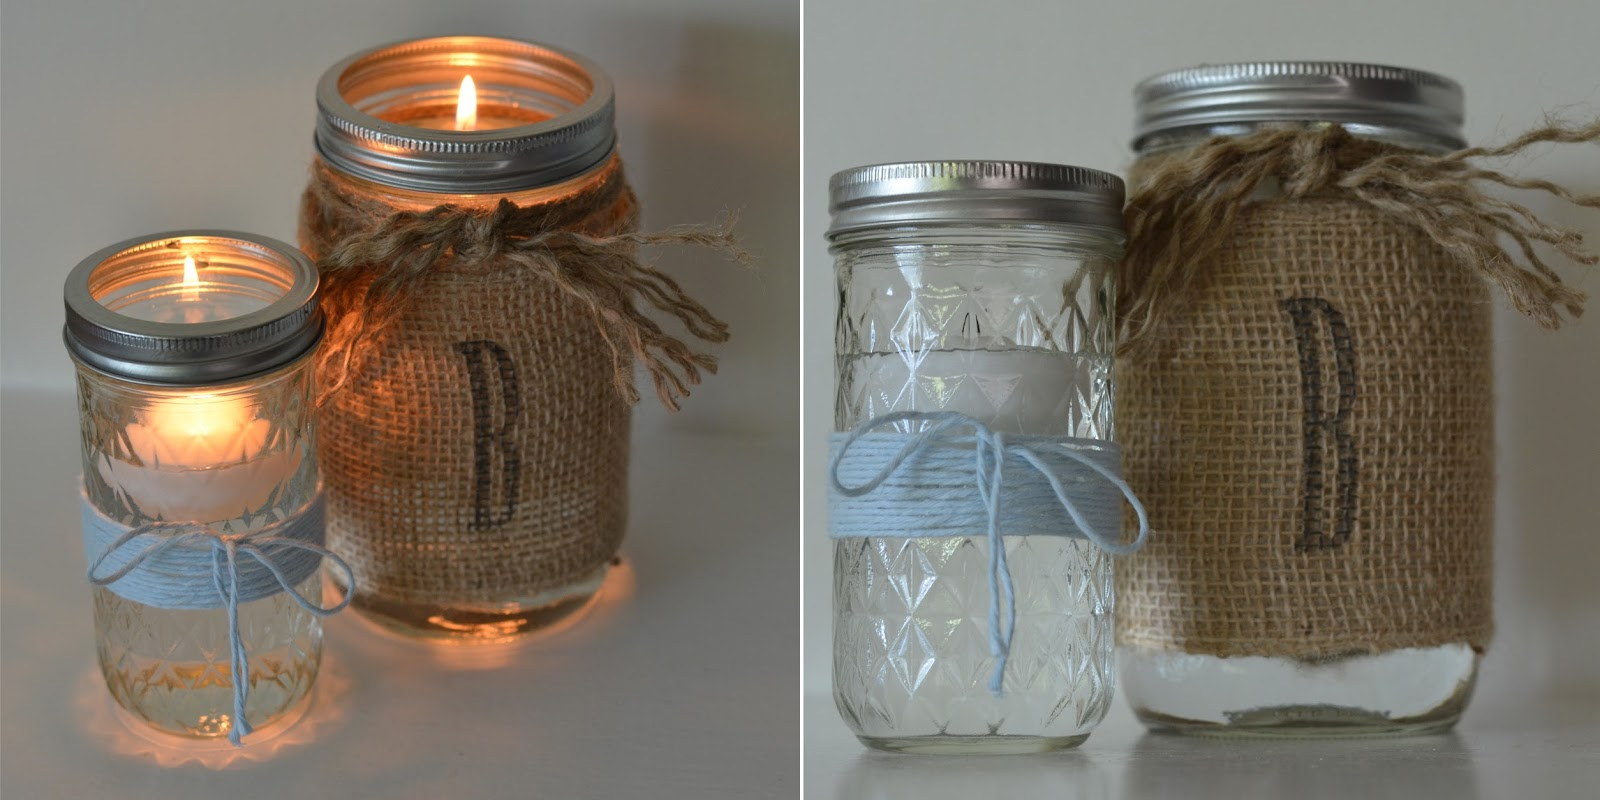 diy 5minute mason jar candles hello glow - HD1600×800